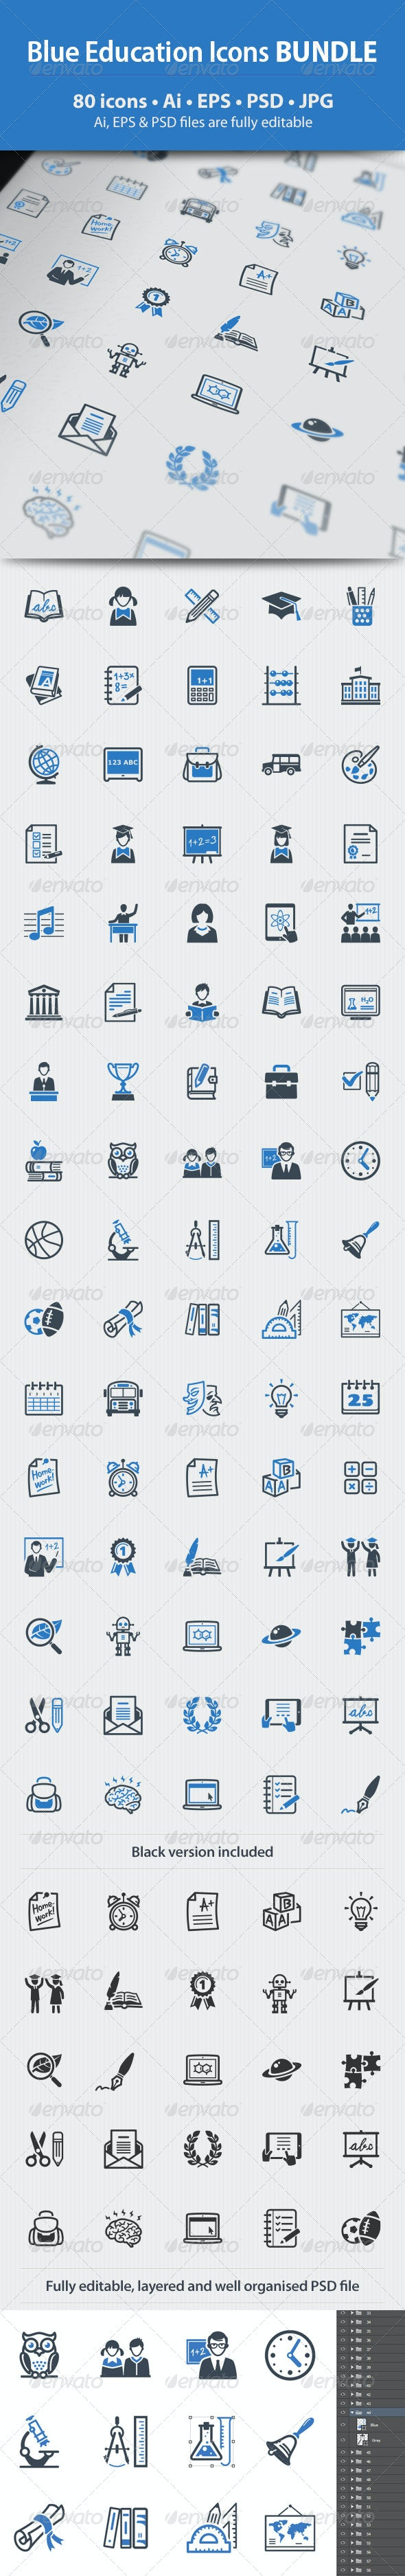 Education Icons - Blue Series Bundle - Web Icons